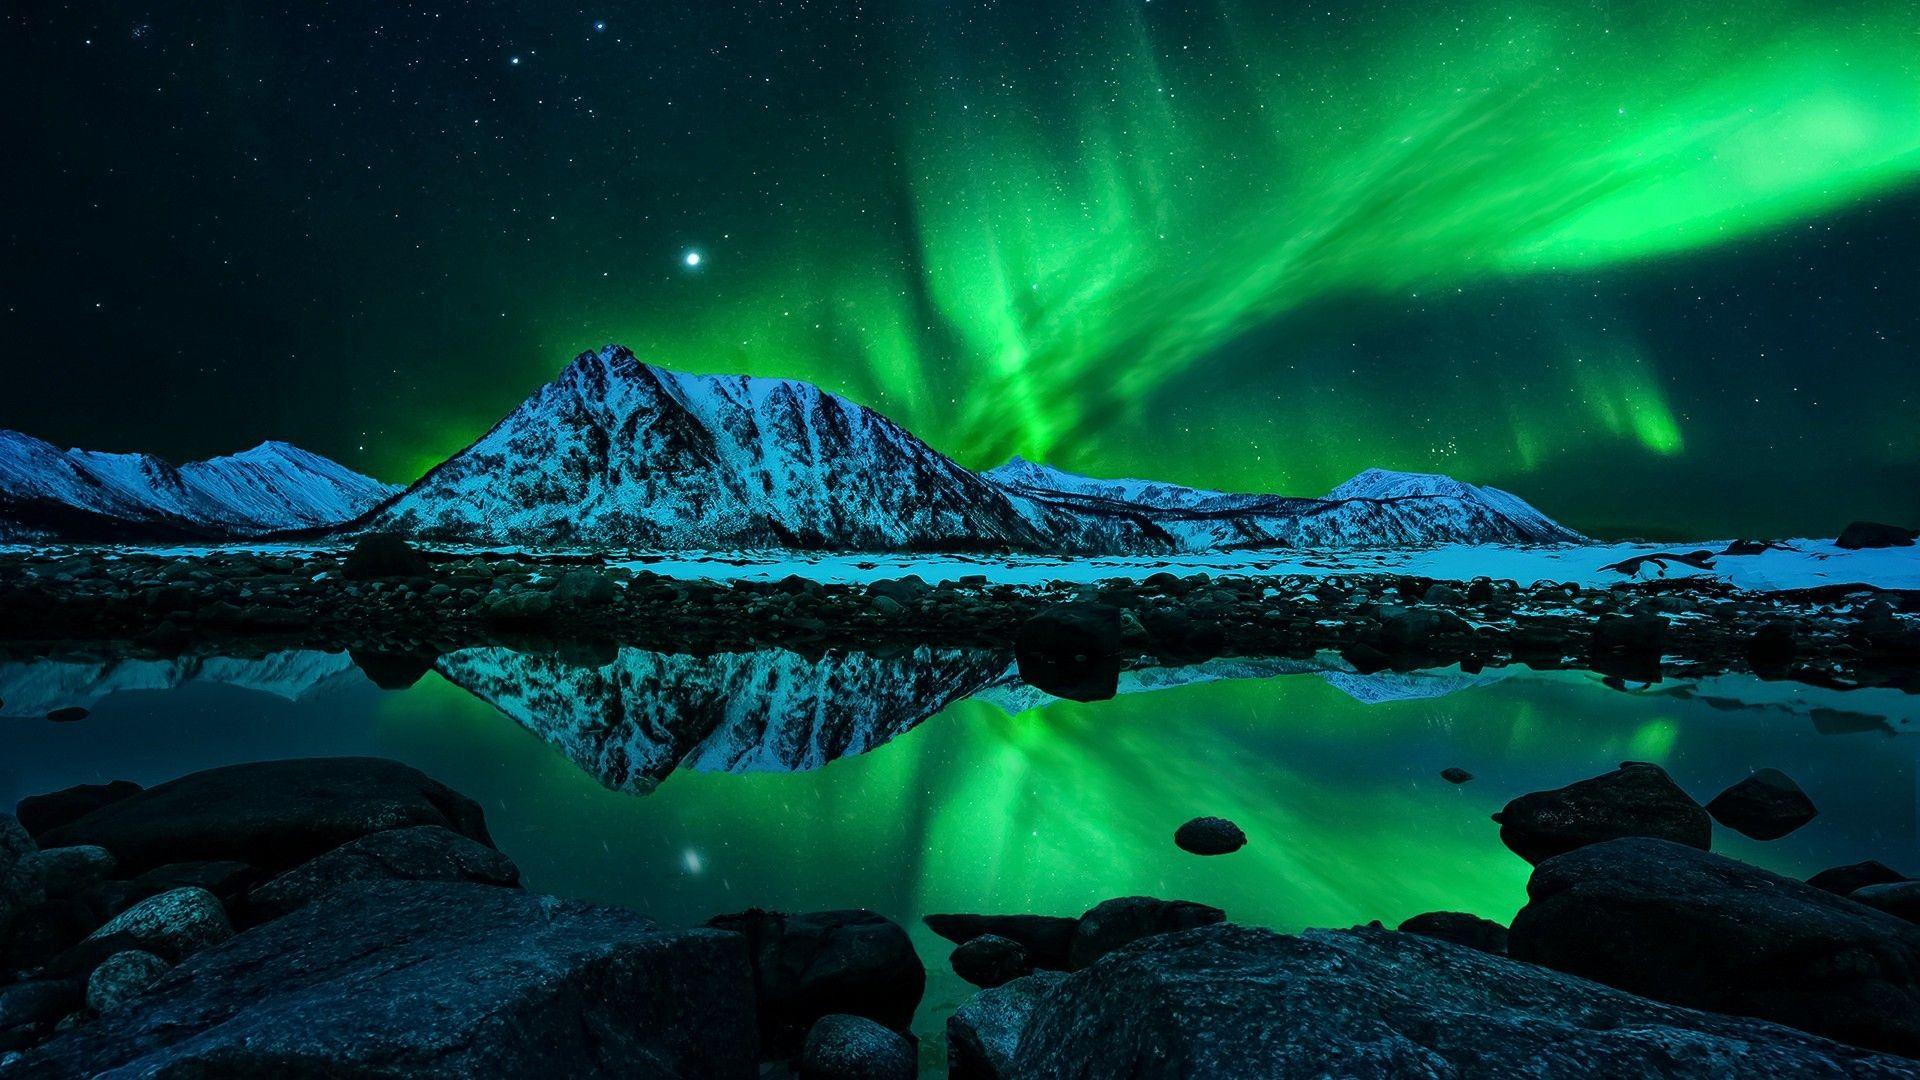 Aurora Wallpaper Hd 2021 Live Wallpaper Hd Northern Lights Wallpaper Aurora Borealis Northern Lights Northern Lights